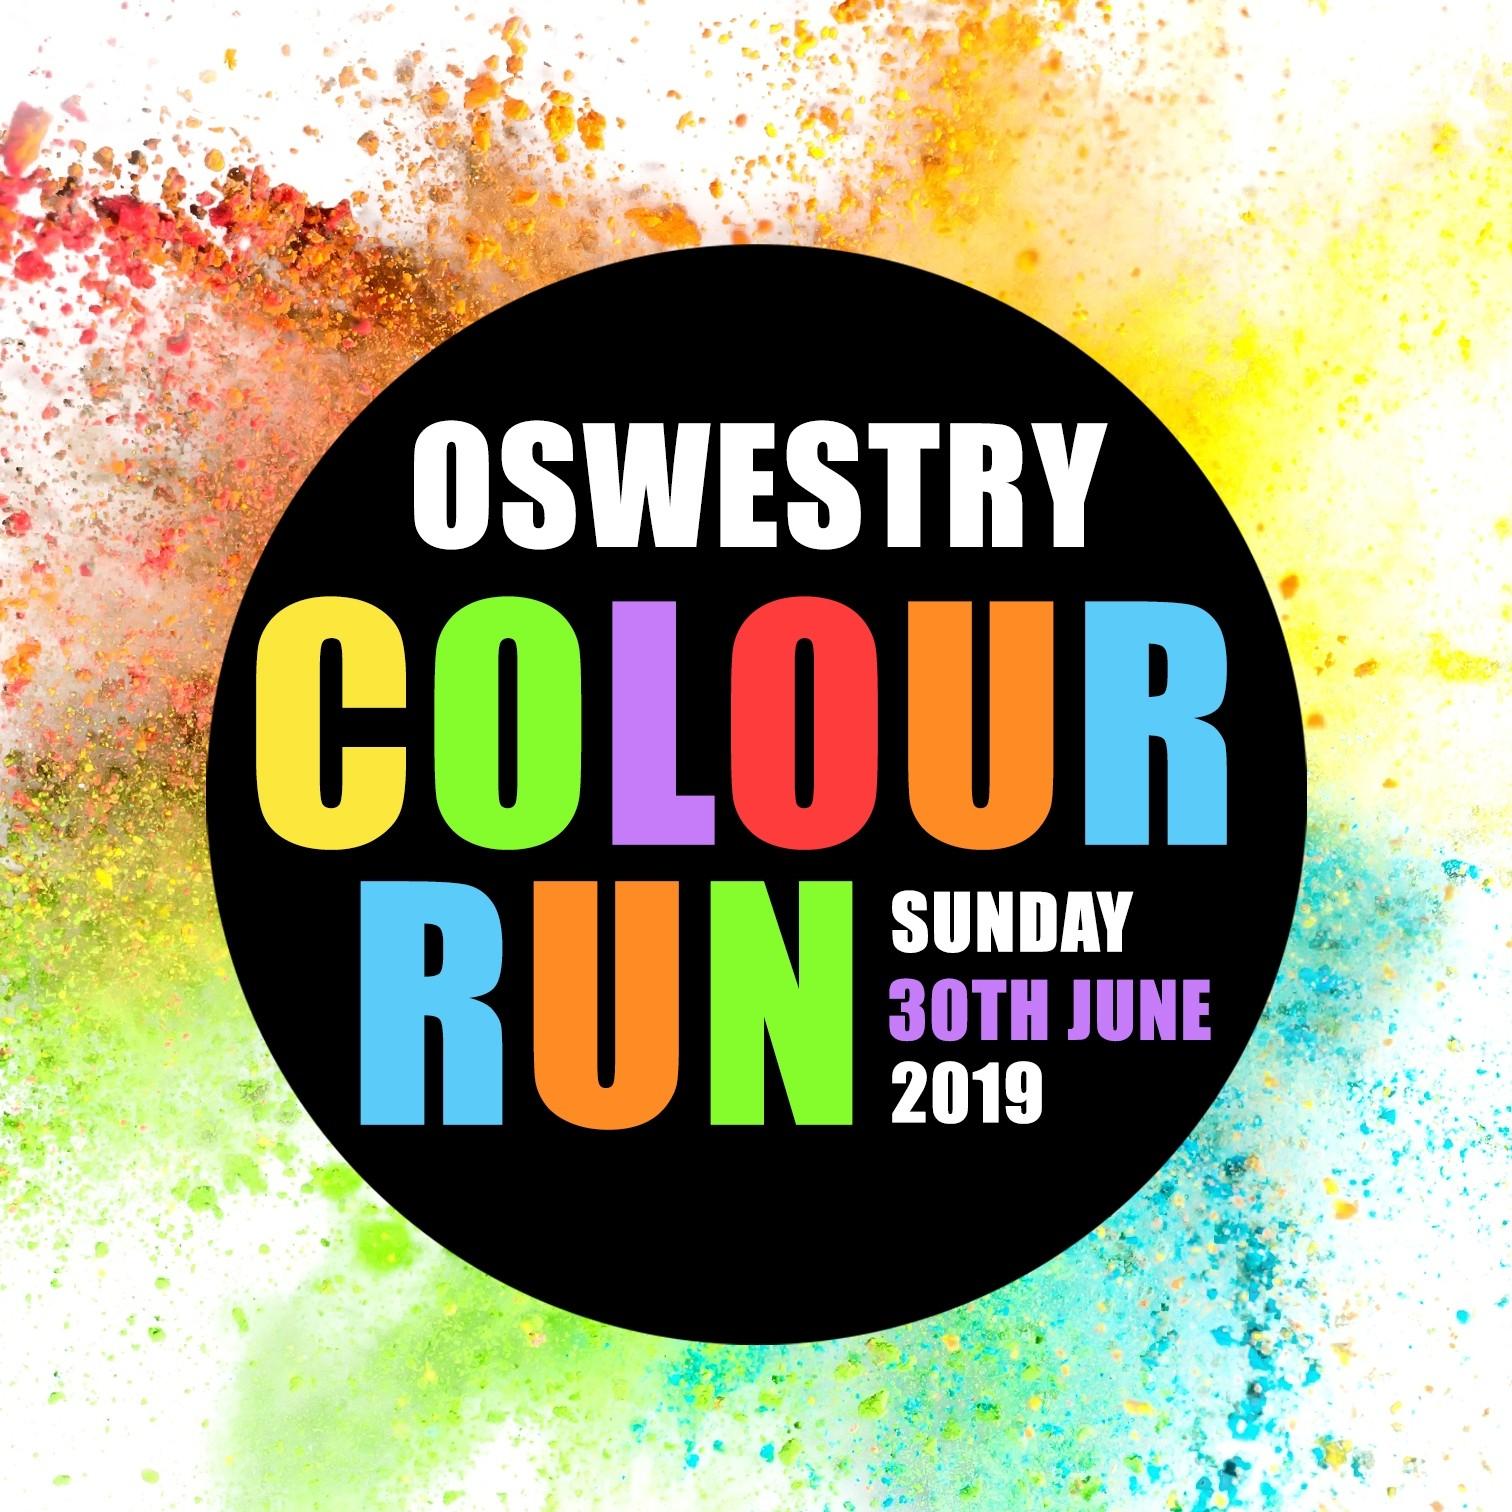 Oswestry Colour Run 2019